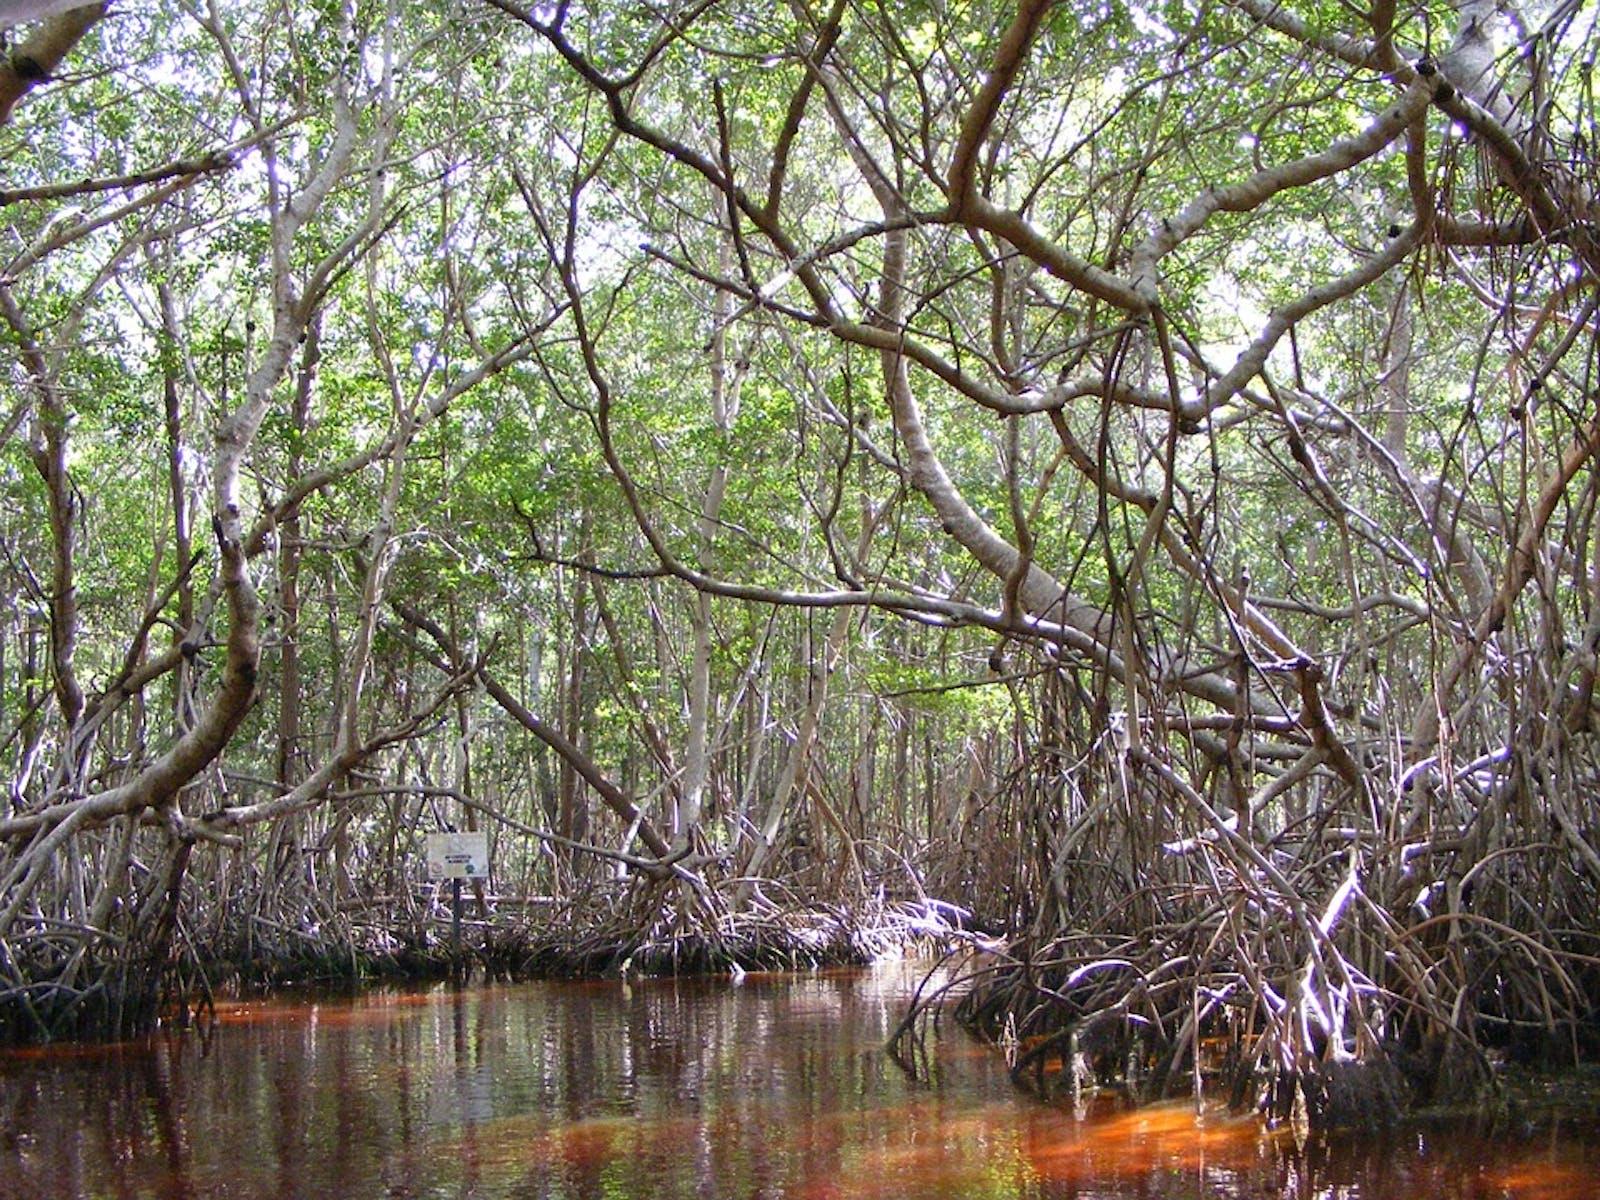 Mesoamerican Gulf-Caribbean Mangroves